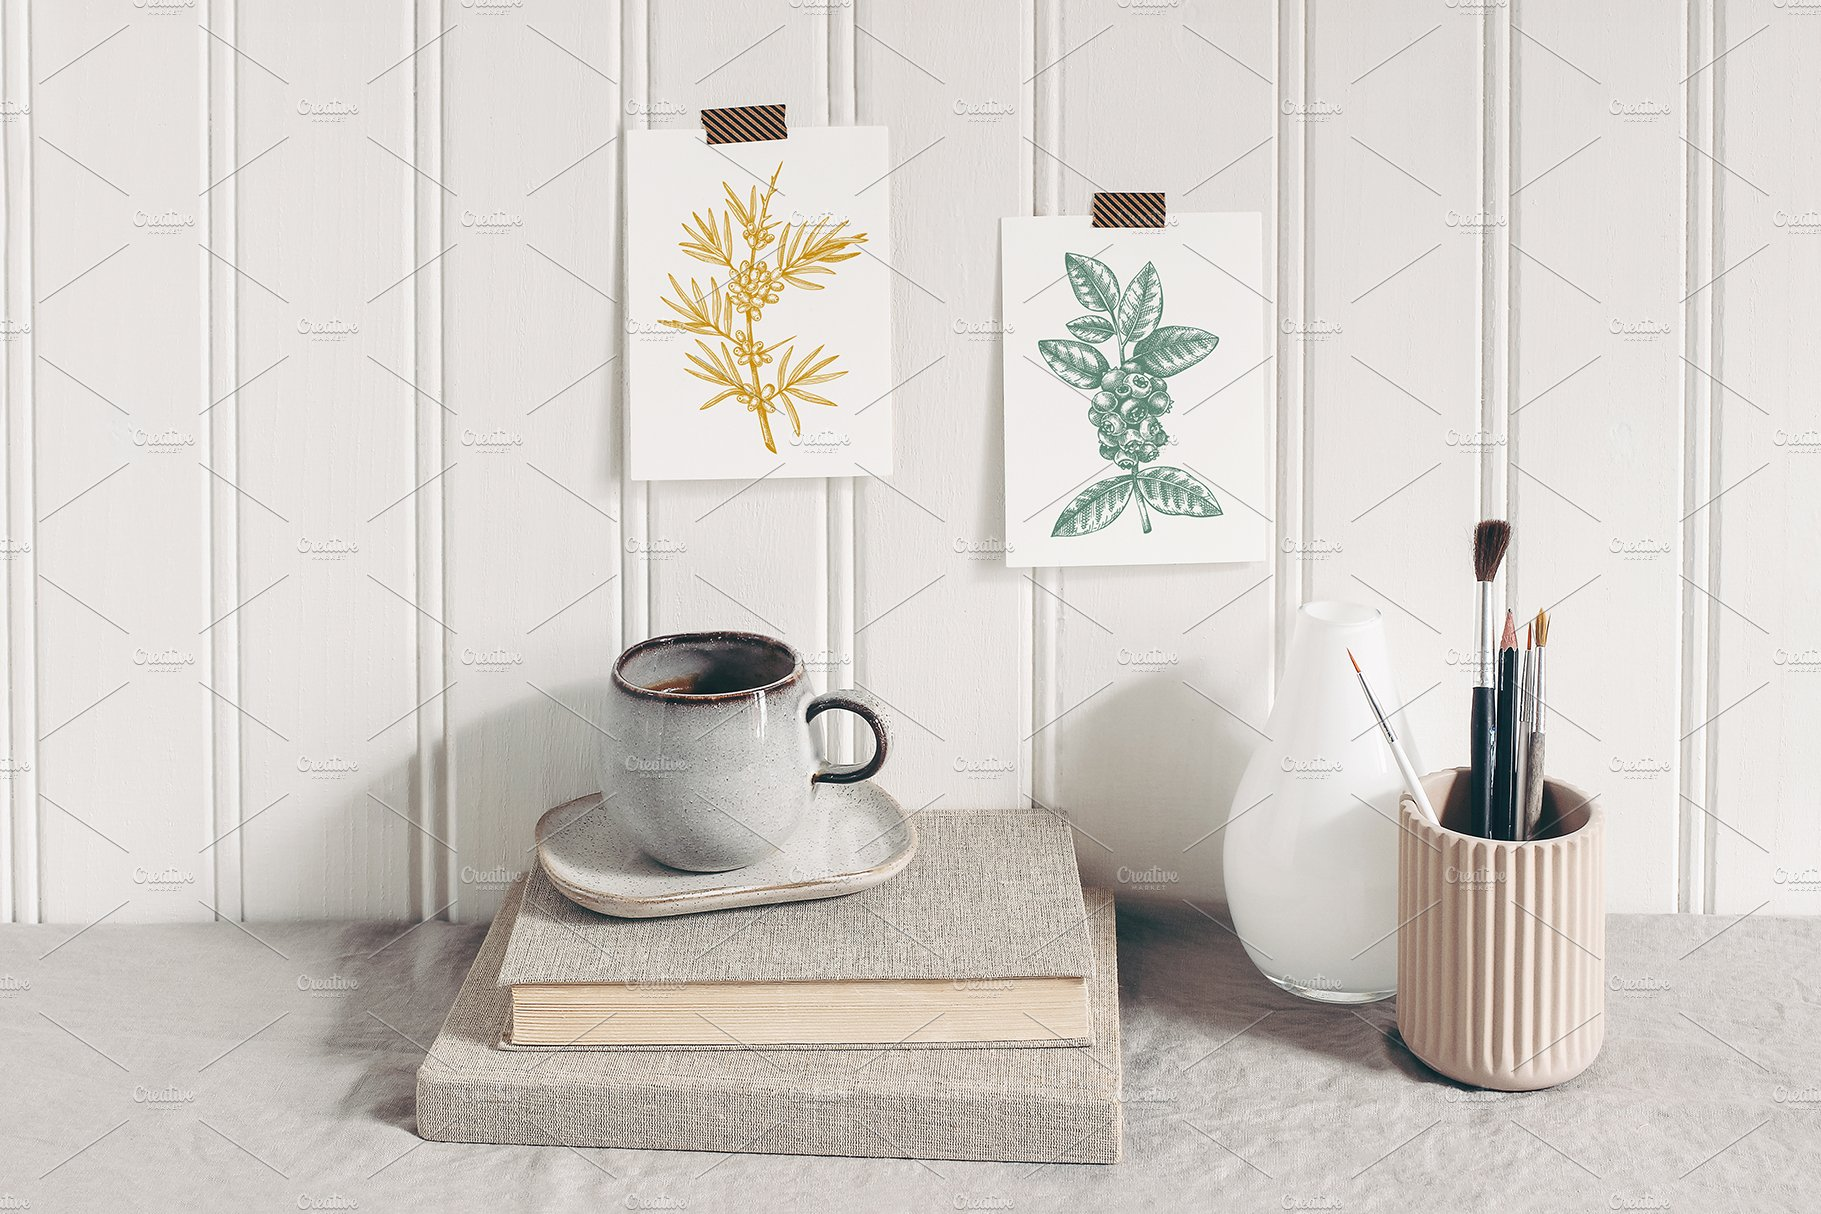 hand drawn berries vectors and designs 03 2